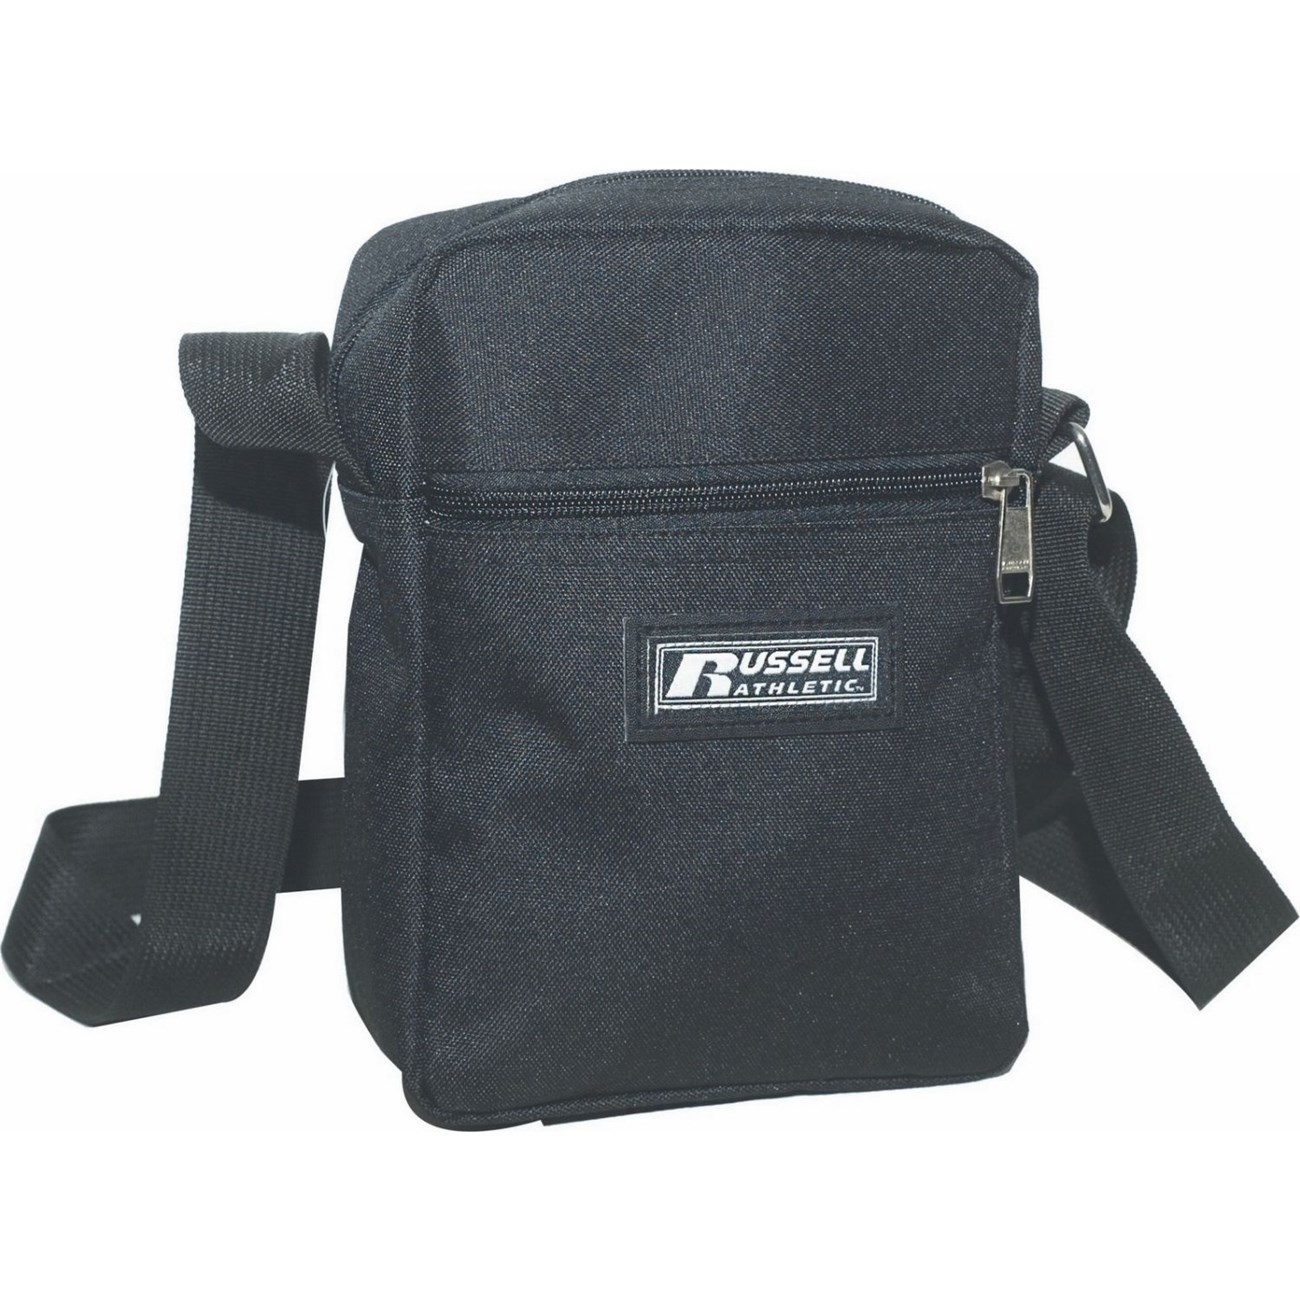 2eed129e0aa RUSSELL ATHLETIC AUBURN SHOULDER BAG < Τσάντες & Σακίδια   INTERSPORT